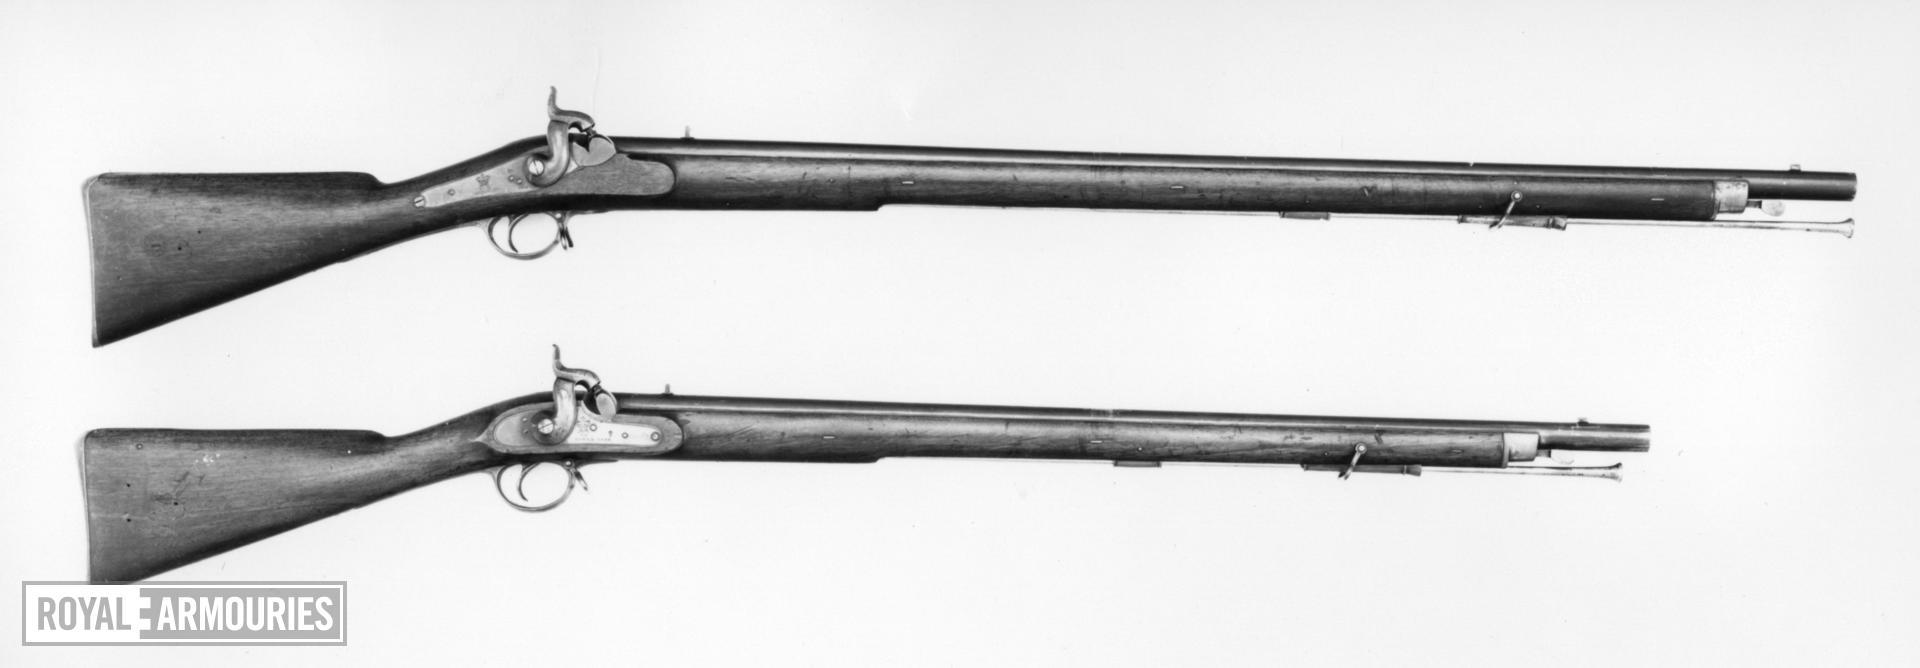 Percussion muzzle-loading military musket - Pattern 1838